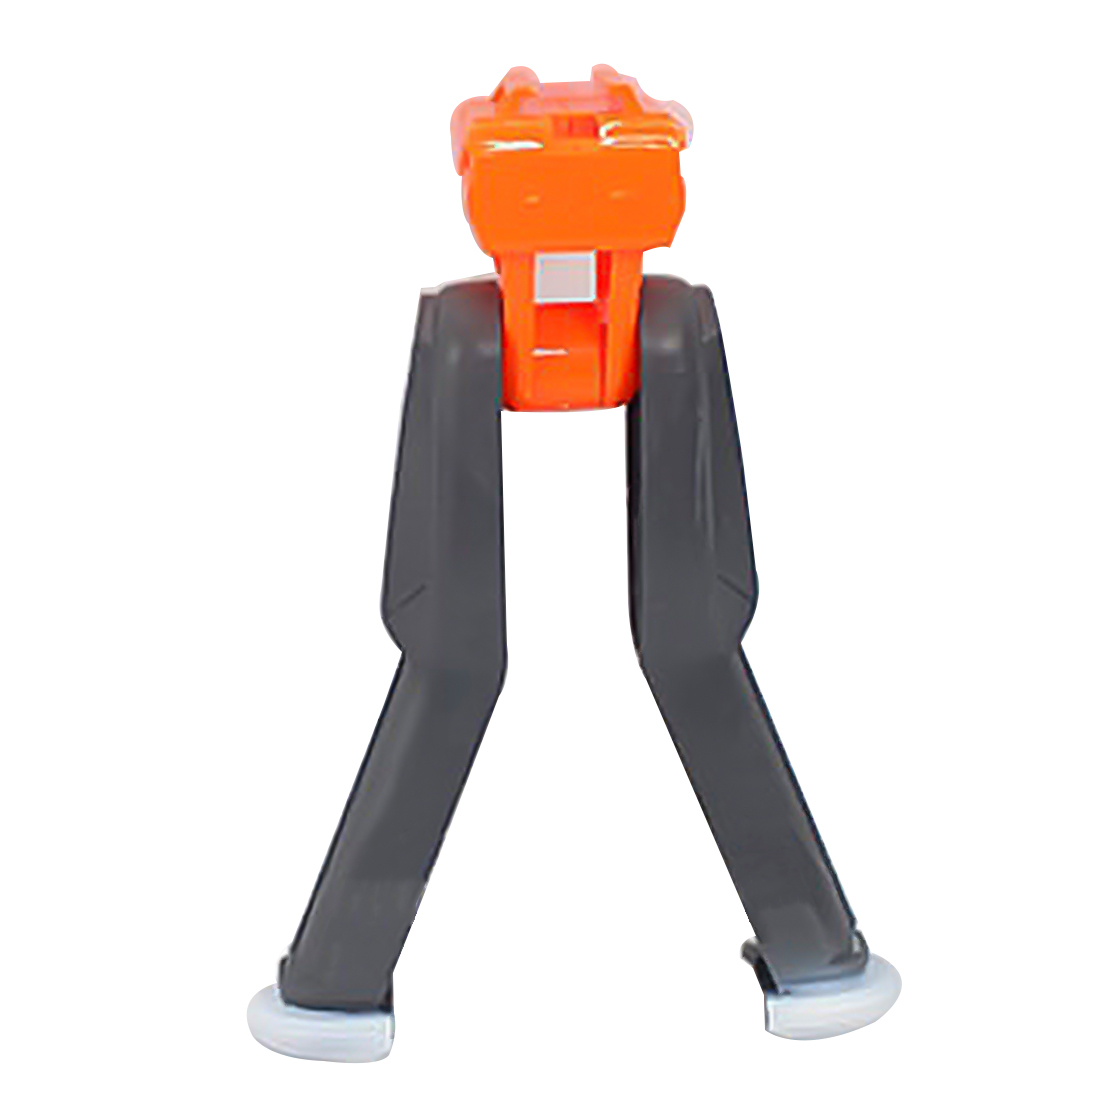 Modified Plastic Folding Bipod For Nerf Retaliator / For Nerf Rapidstrike / For Nerf Stryfe - Orange + Grey